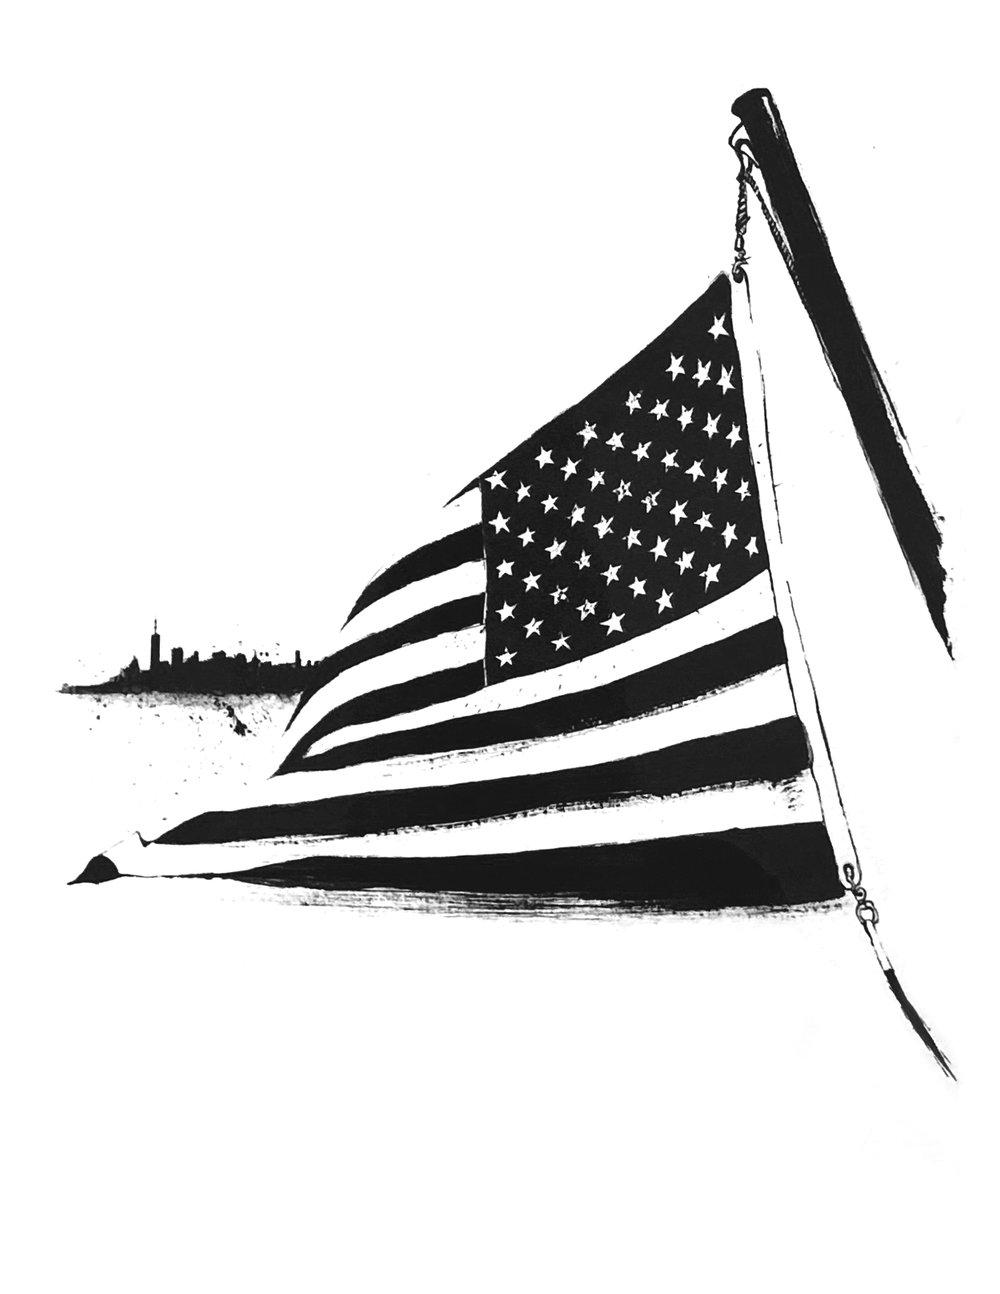 Flag_Kneeslappa.jpg